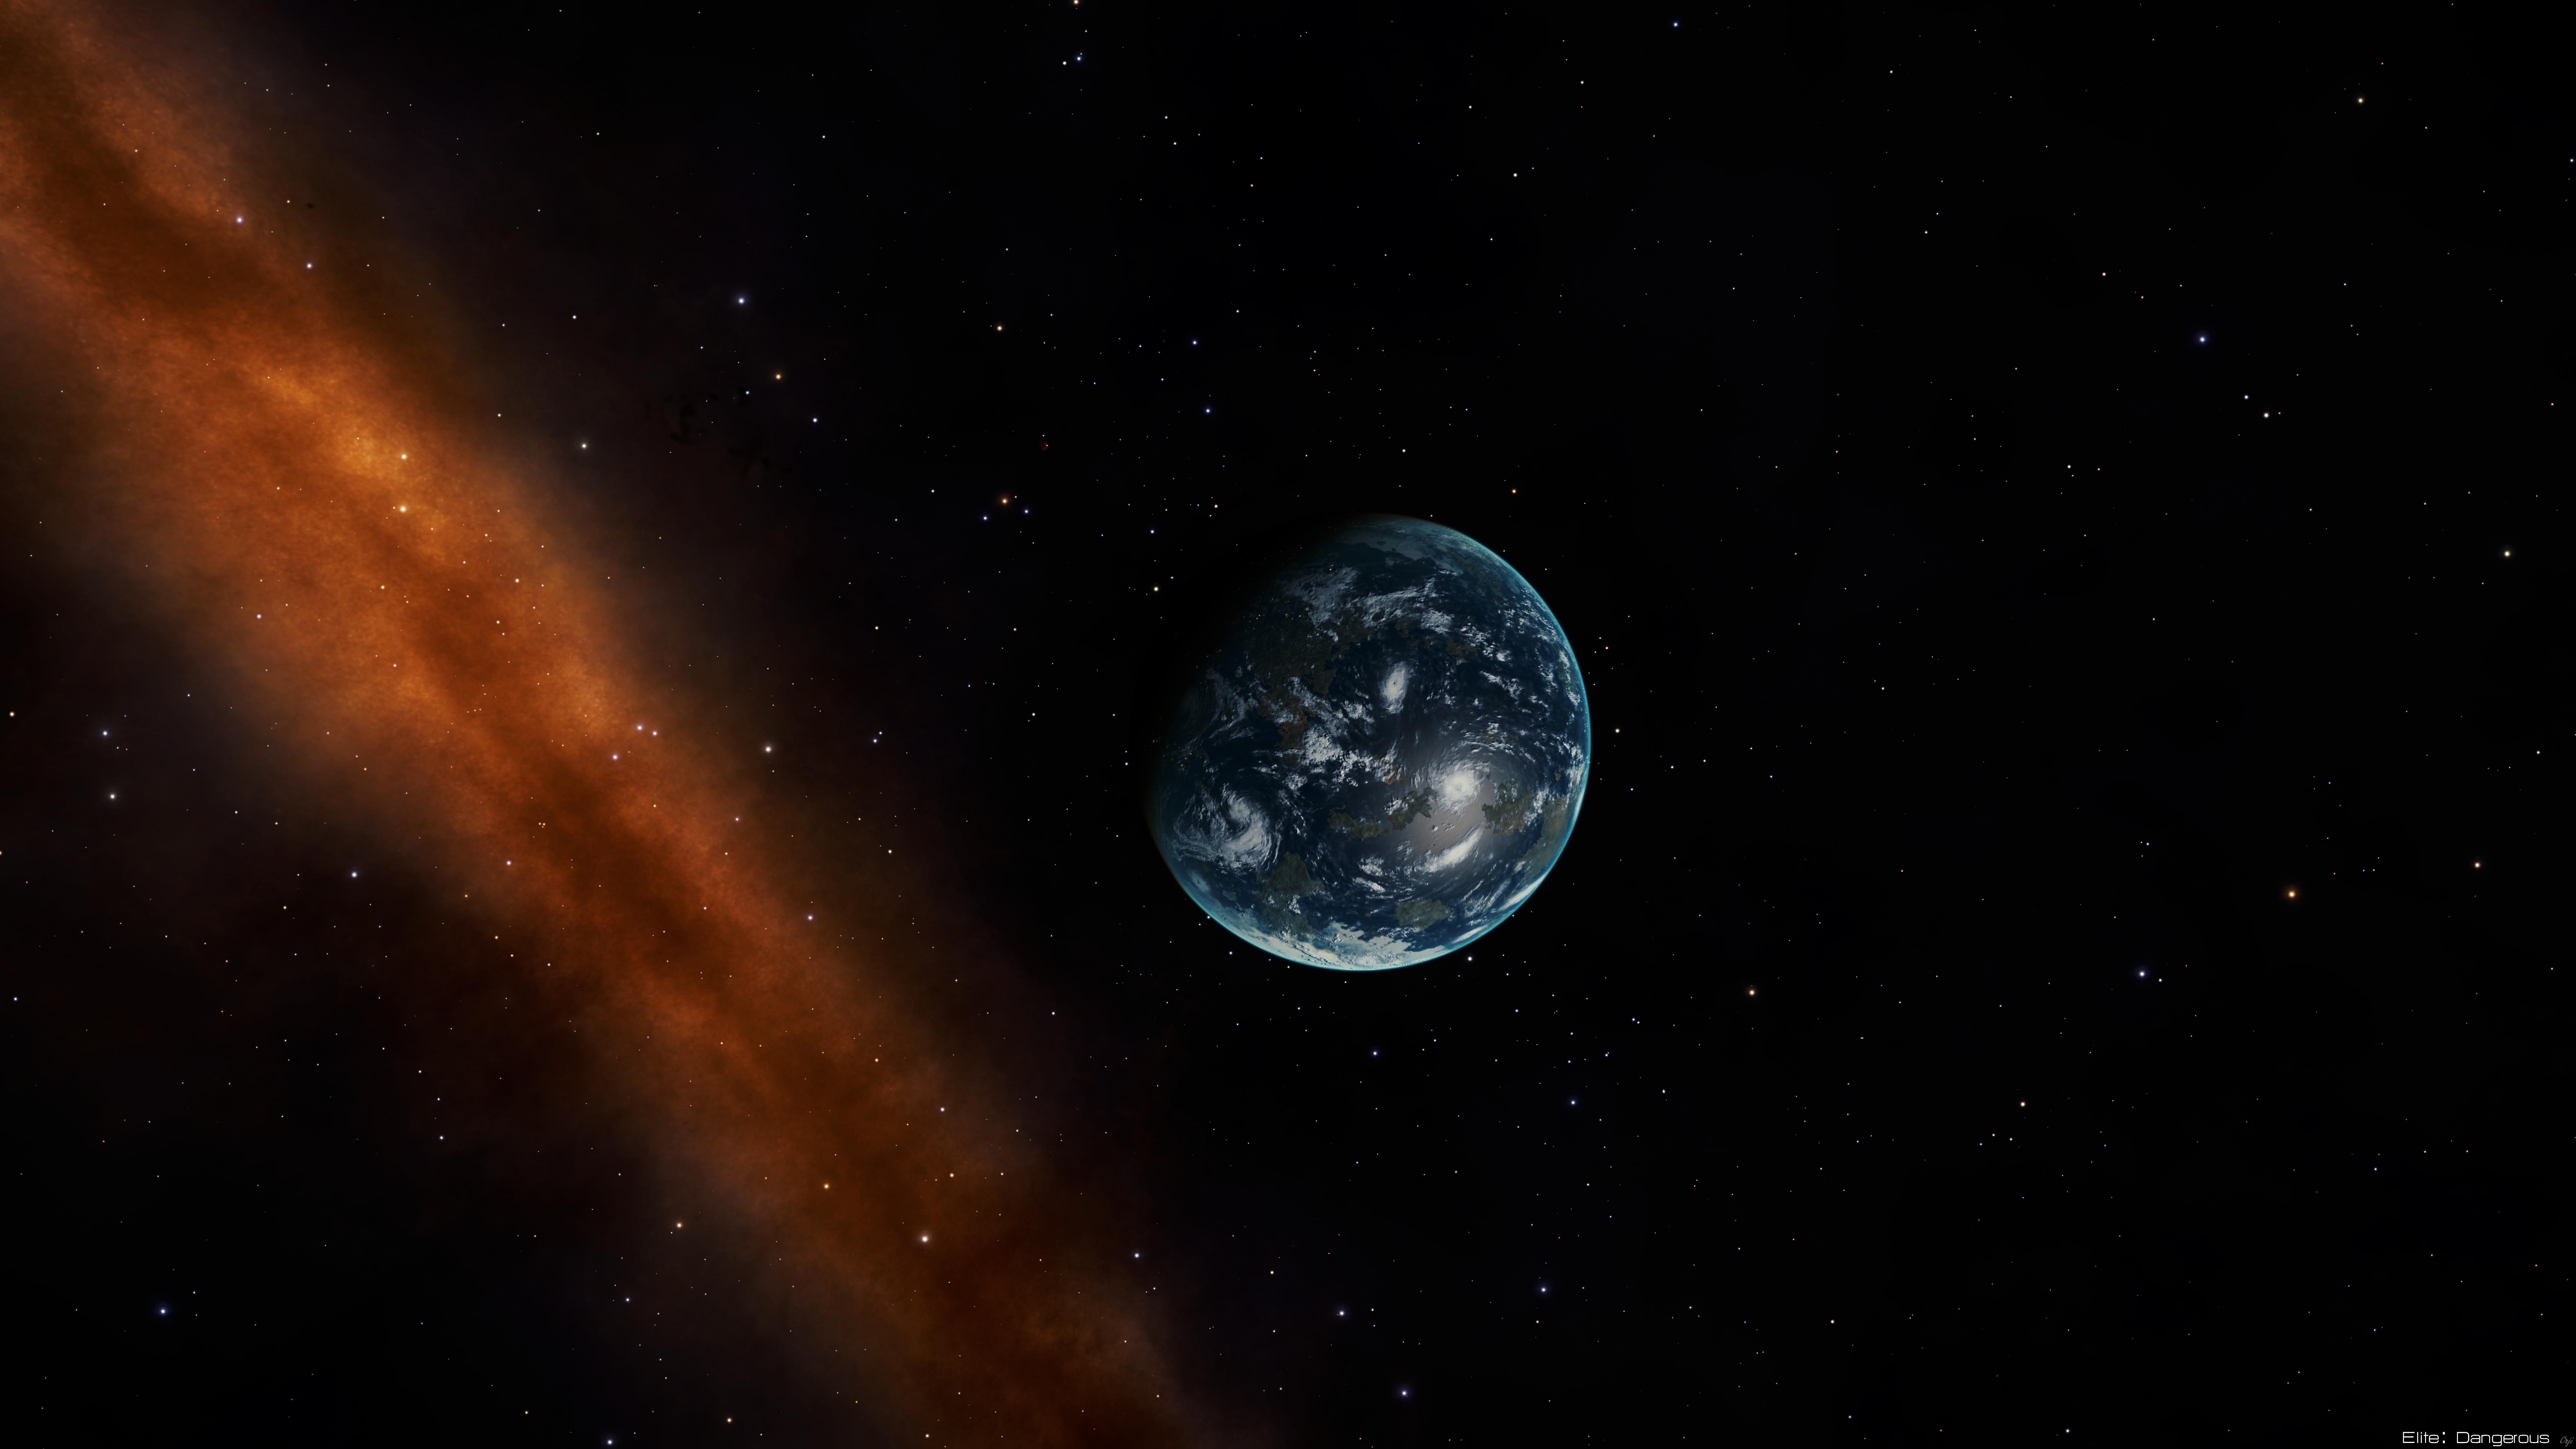 elite__dangerous___lft_37__planet_by_orji247-da9hu2u.png